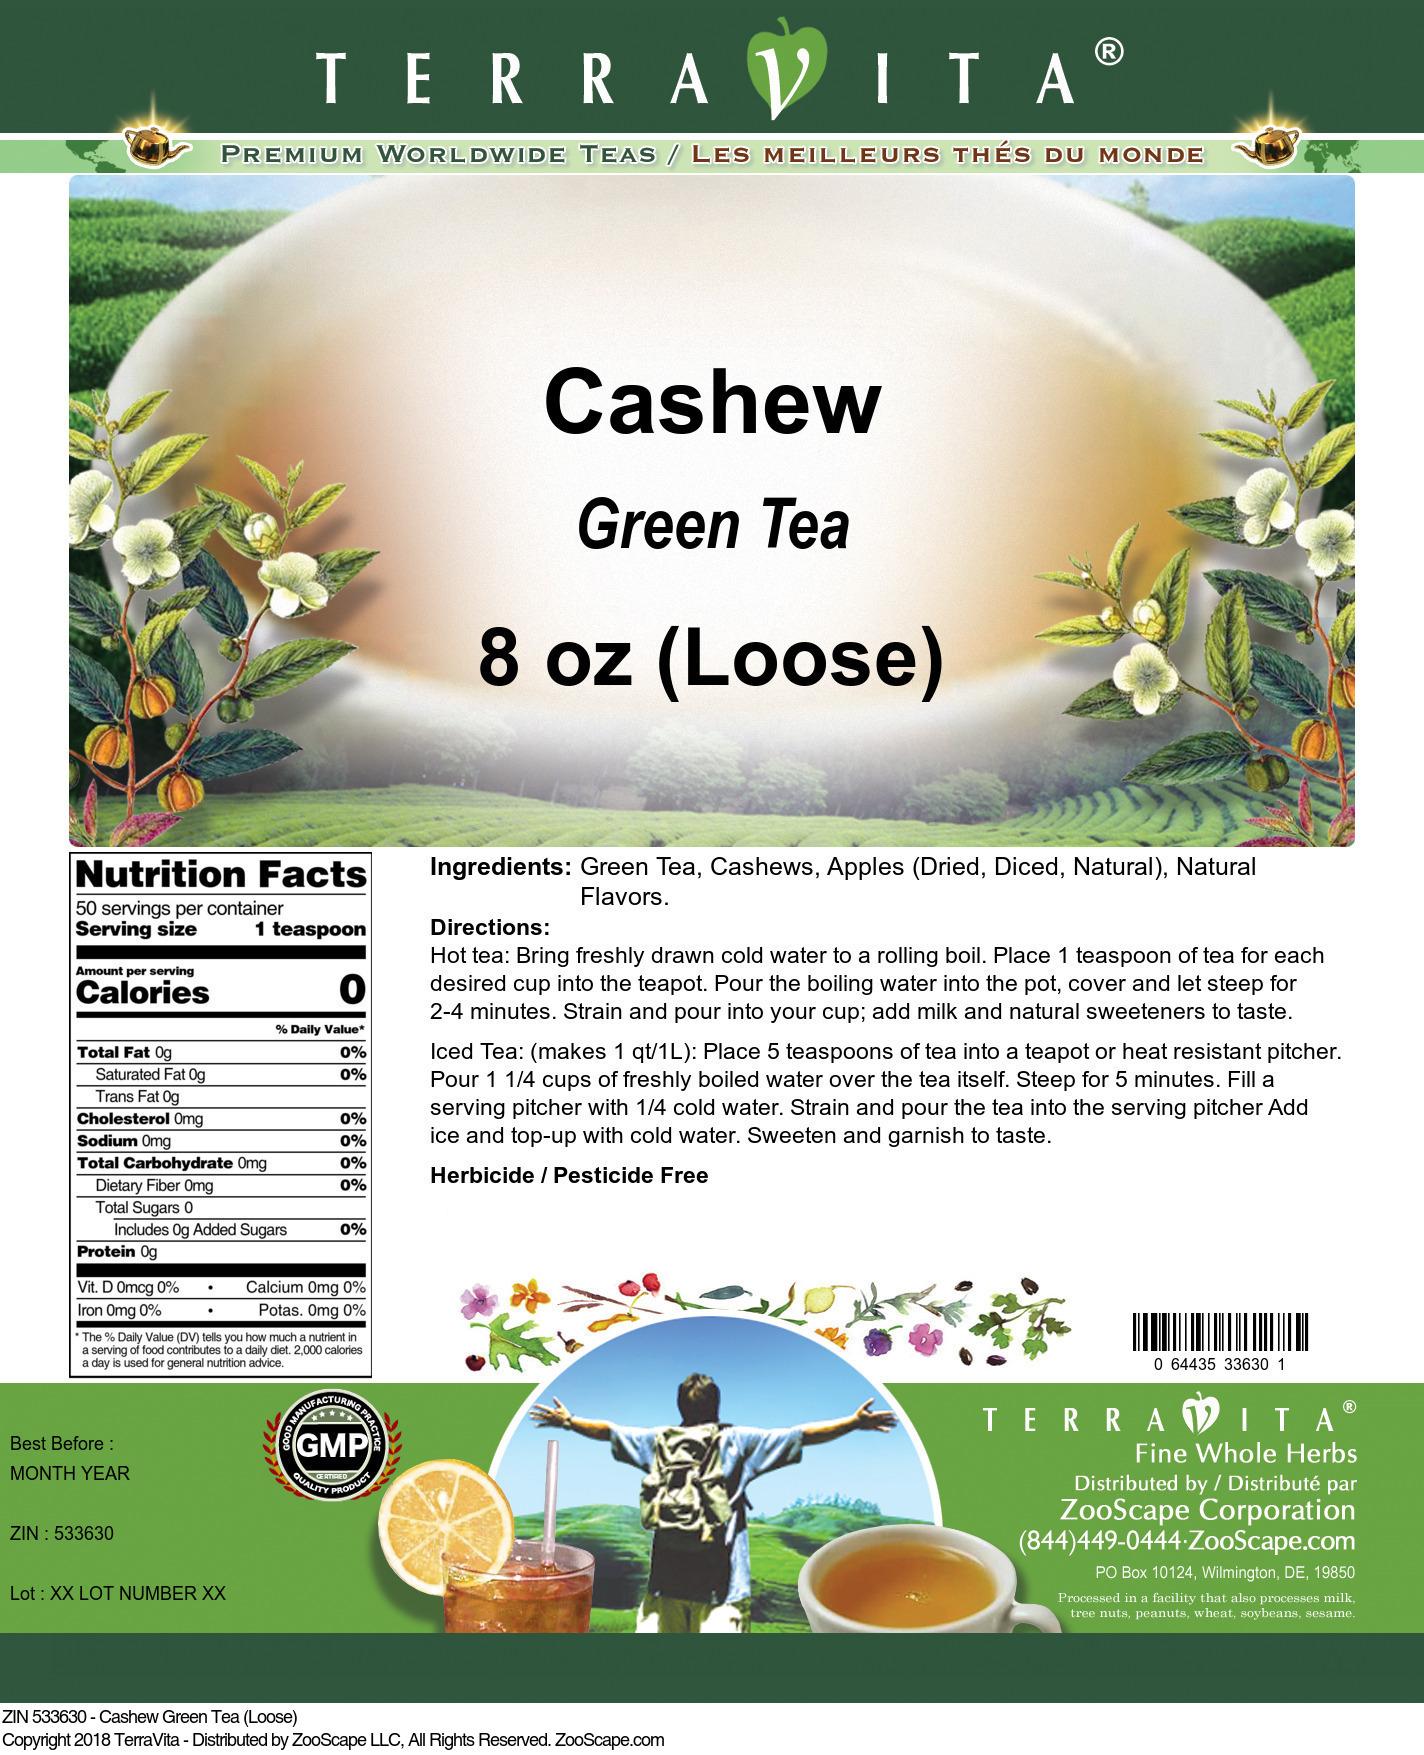 Cashew Green Tea (Loose)